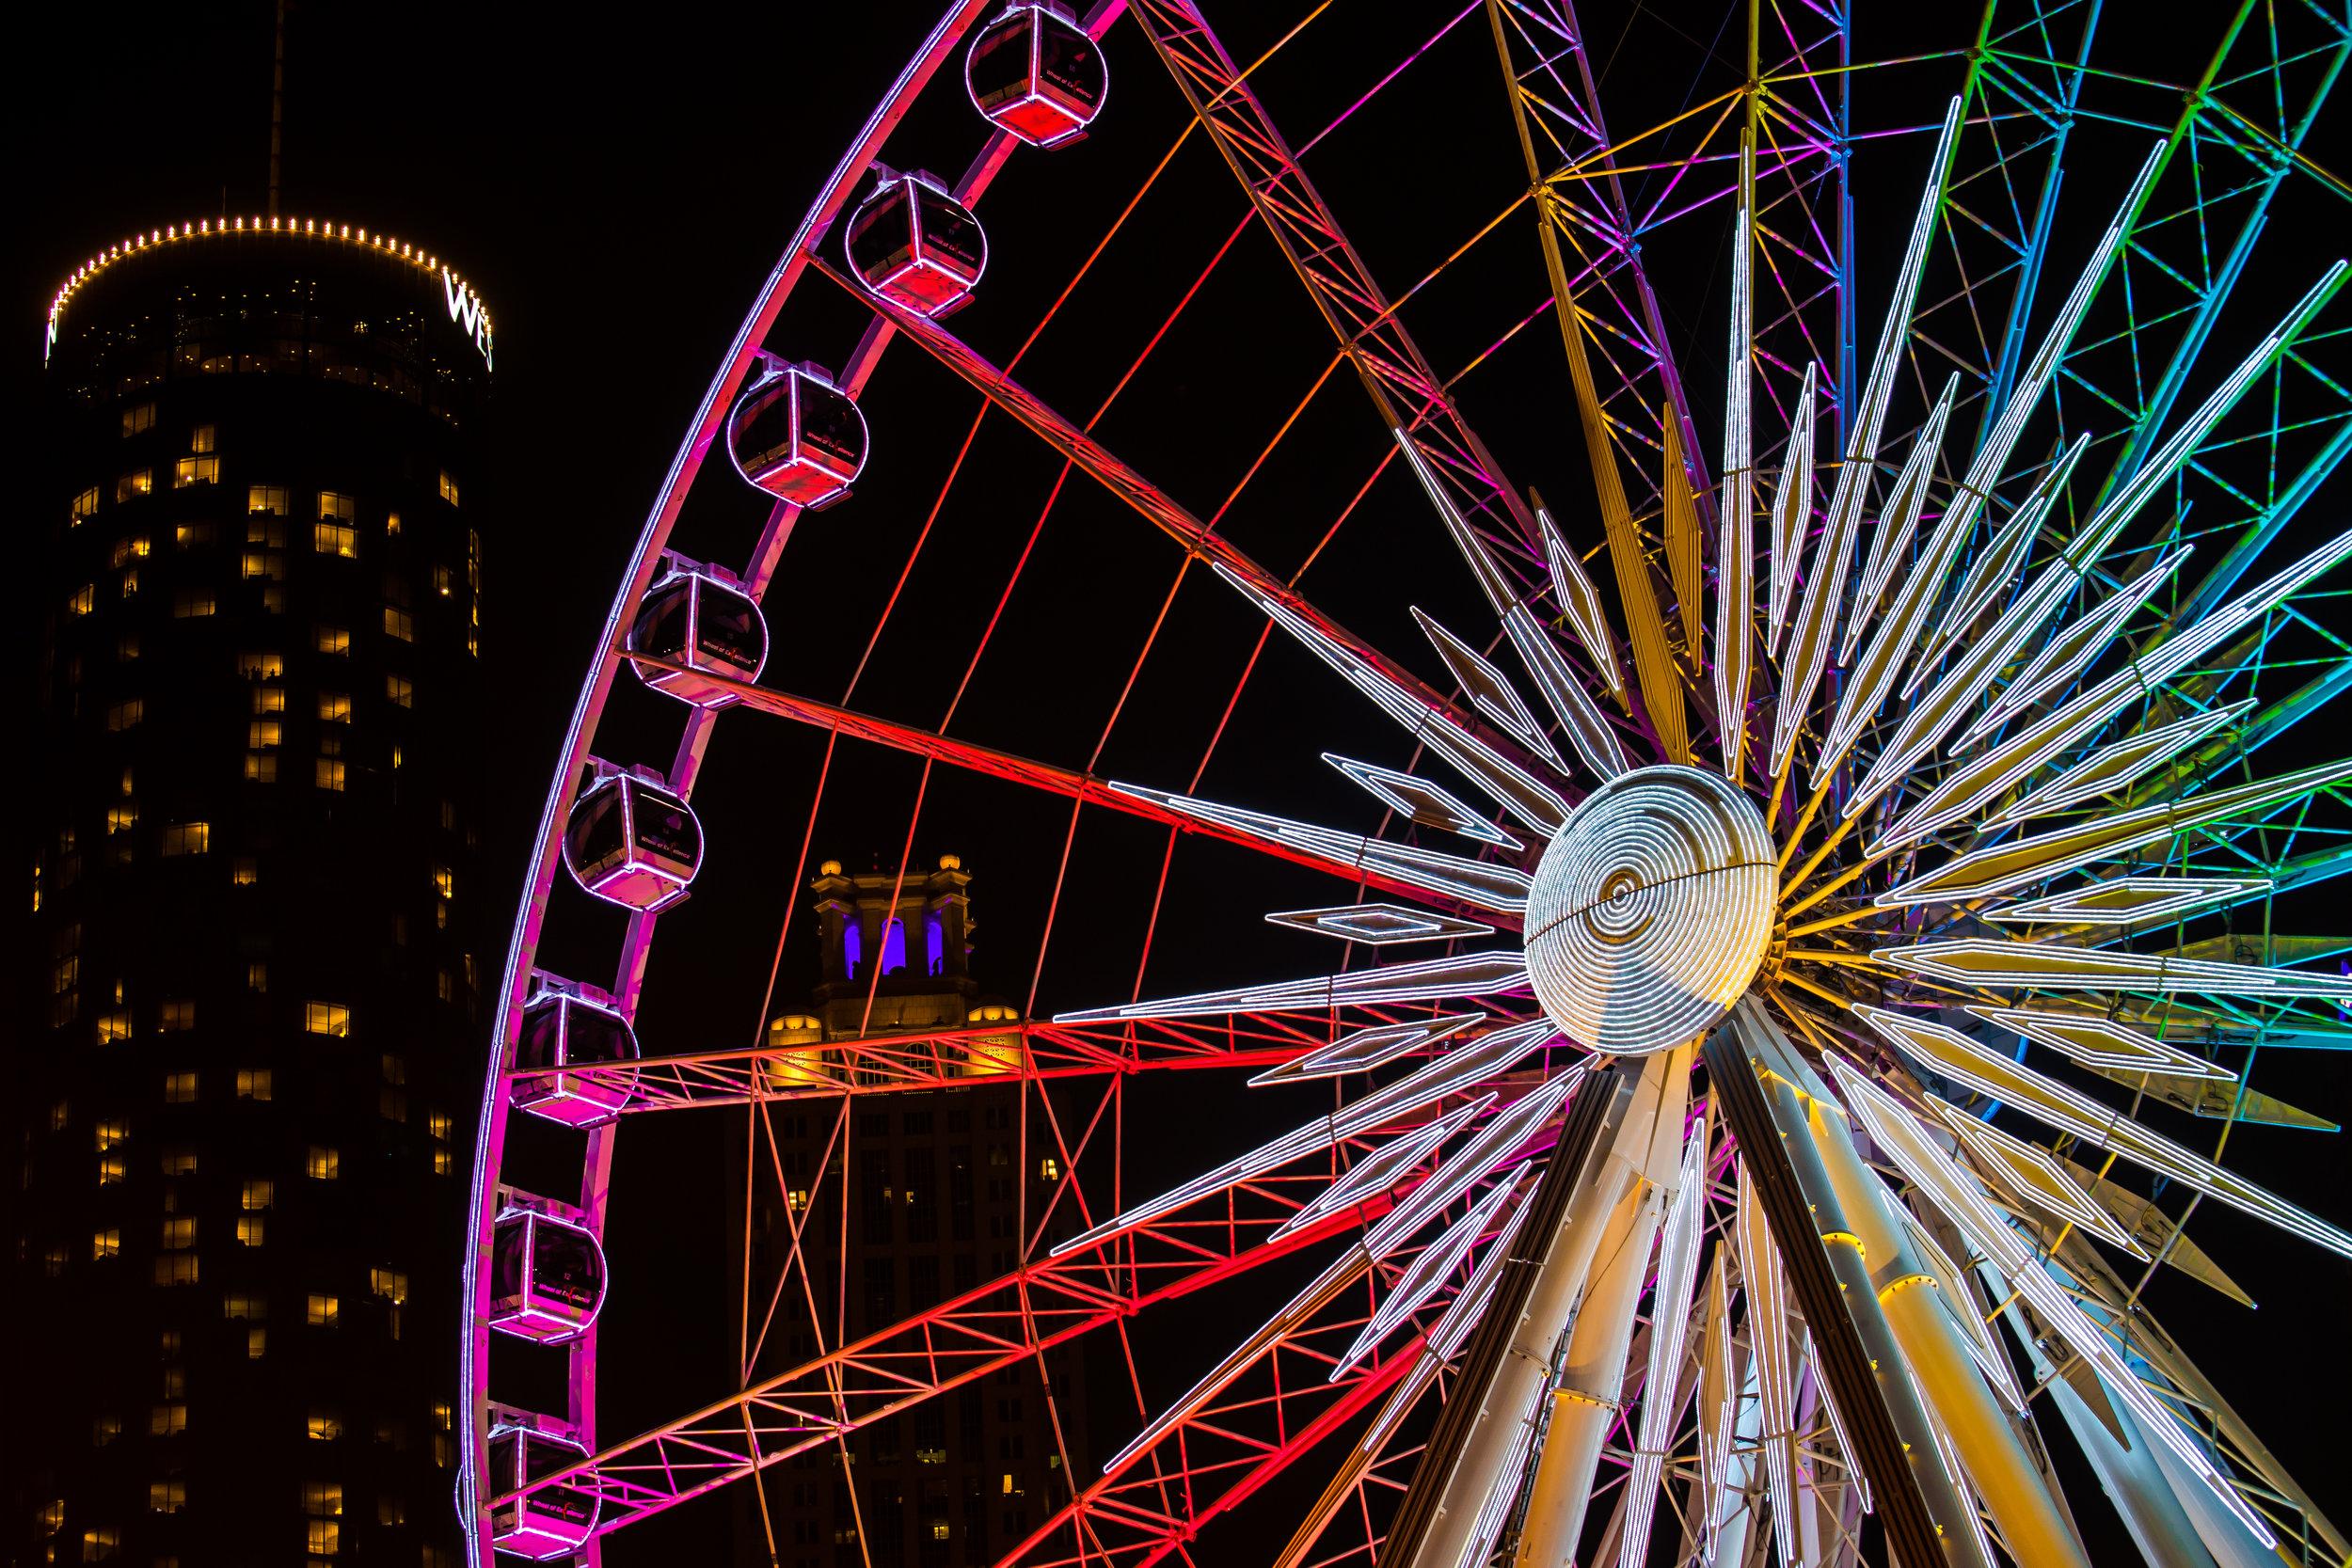 Neon Rainbow - Atlanta - 2014